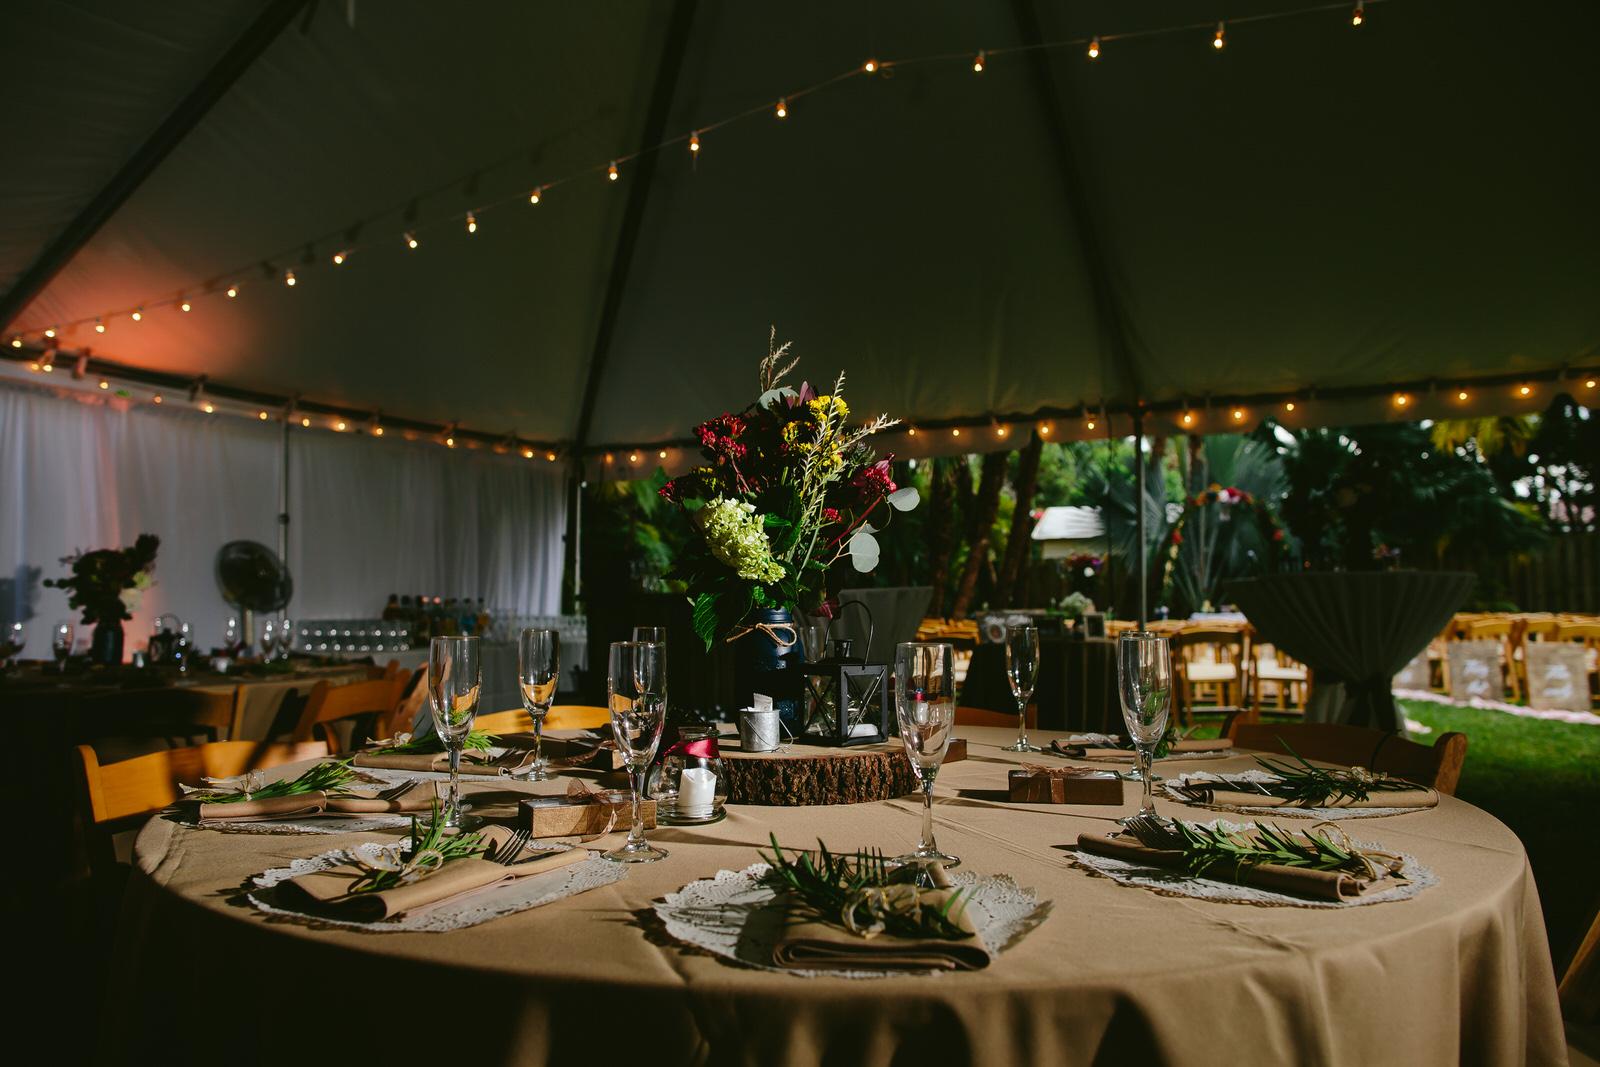 pinecrest_backyard_wedding_tiny_house_photo_candids-4.jpg